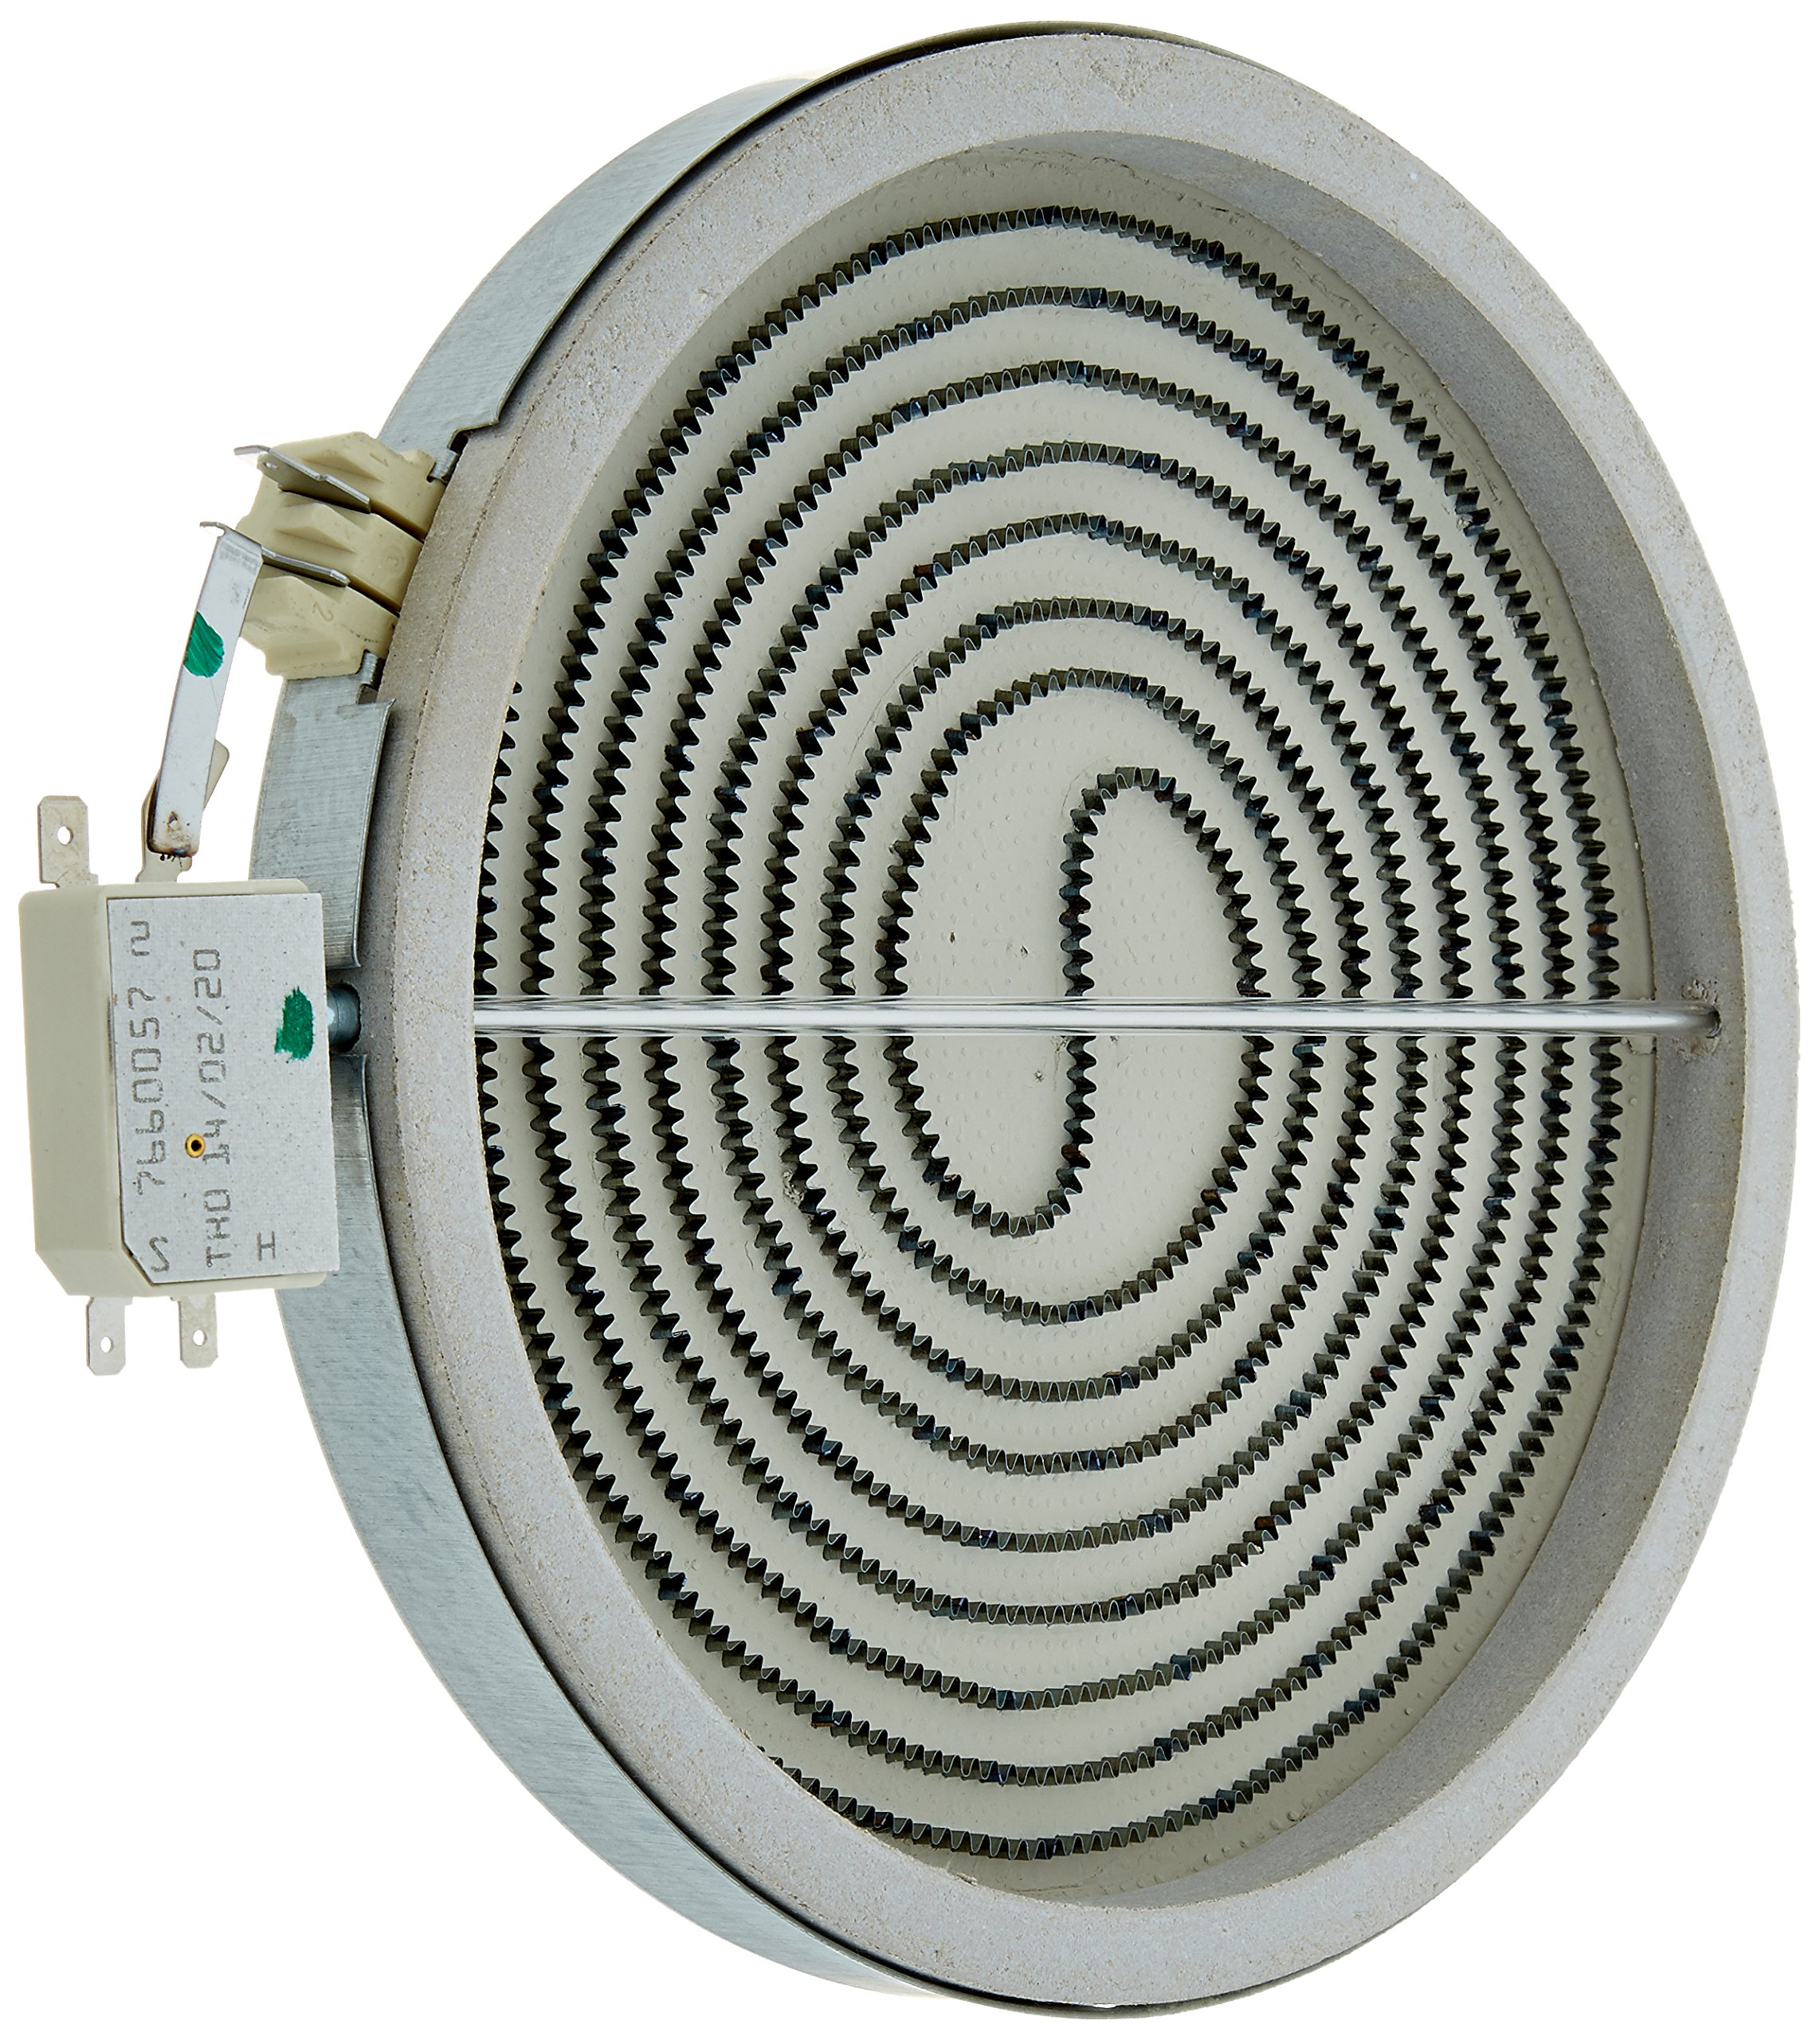 Frigidaire 318198834 Range/Stove/Oven Radiant Surface Element by Frigidaire (Image #2)